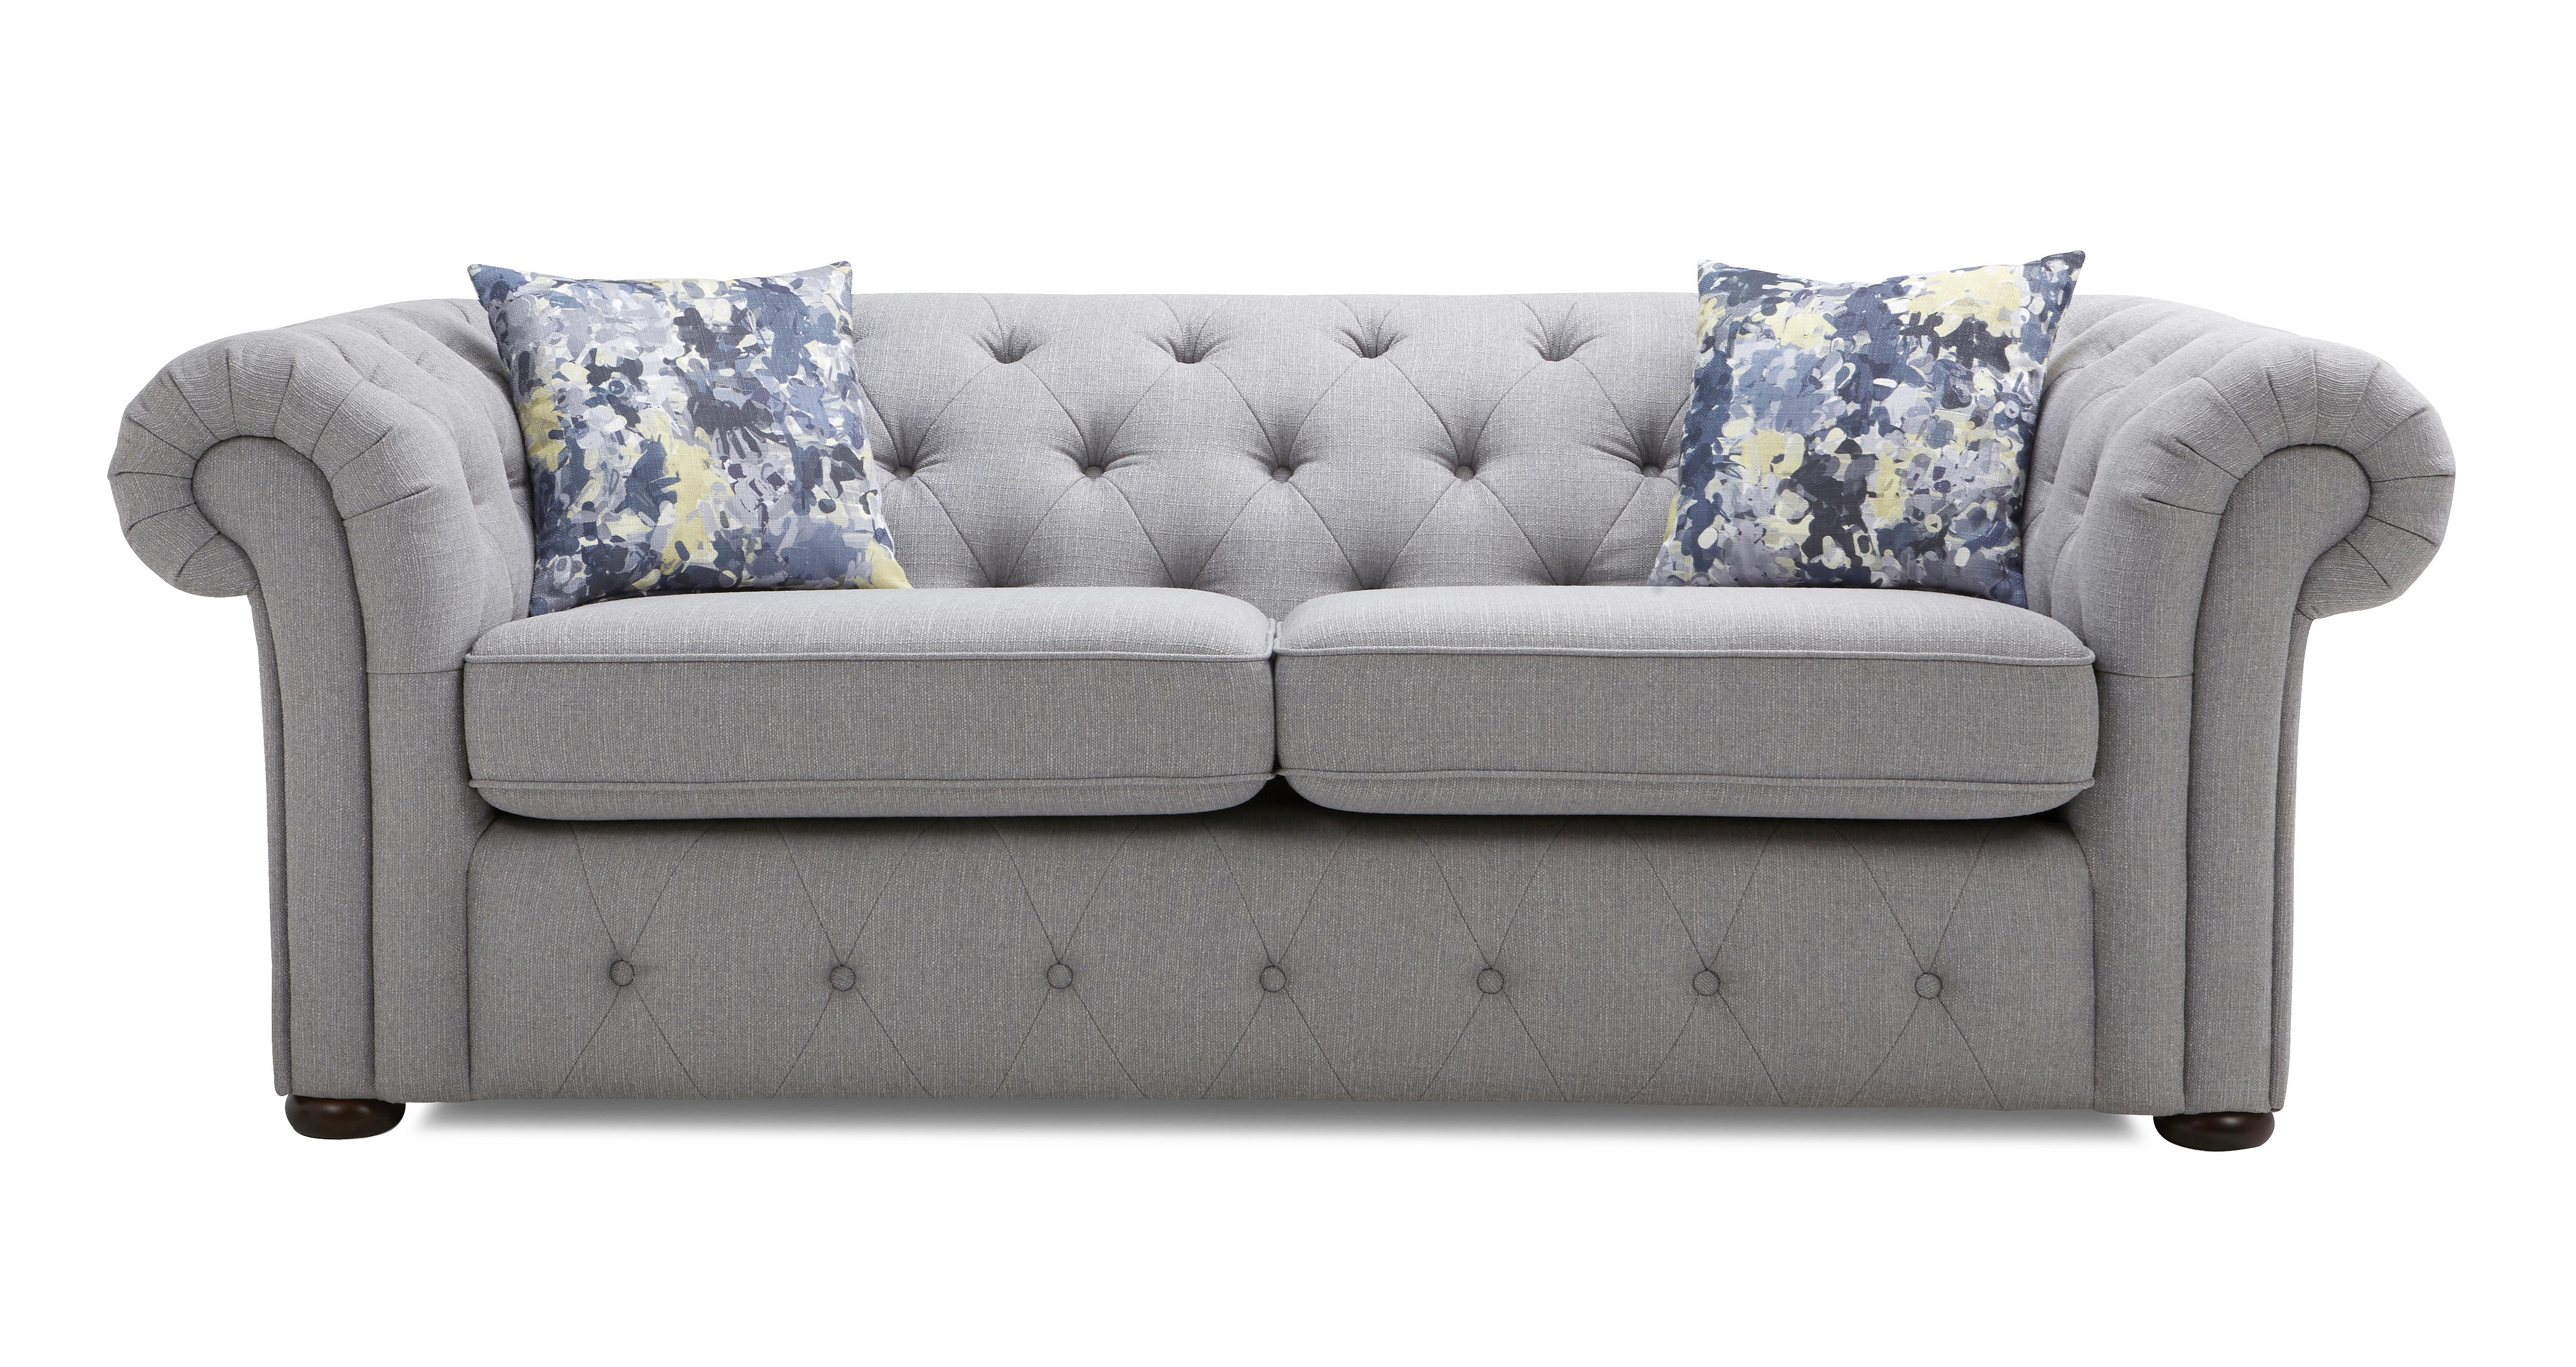 Fresh Sofa Clearance Marmsweb Marmsweb